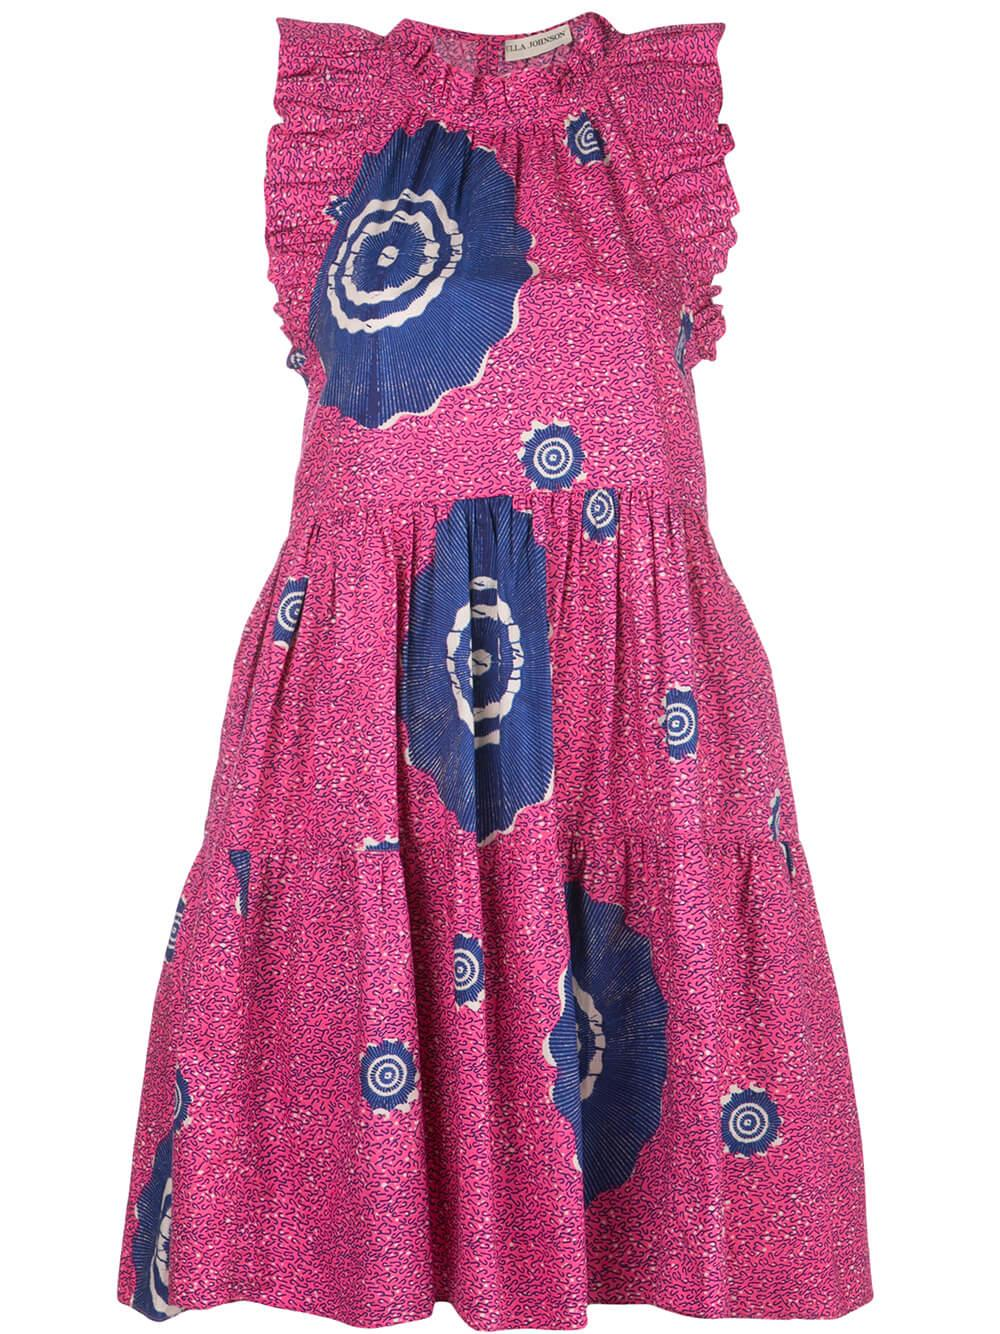 Tamsin Dress Item # PS200109